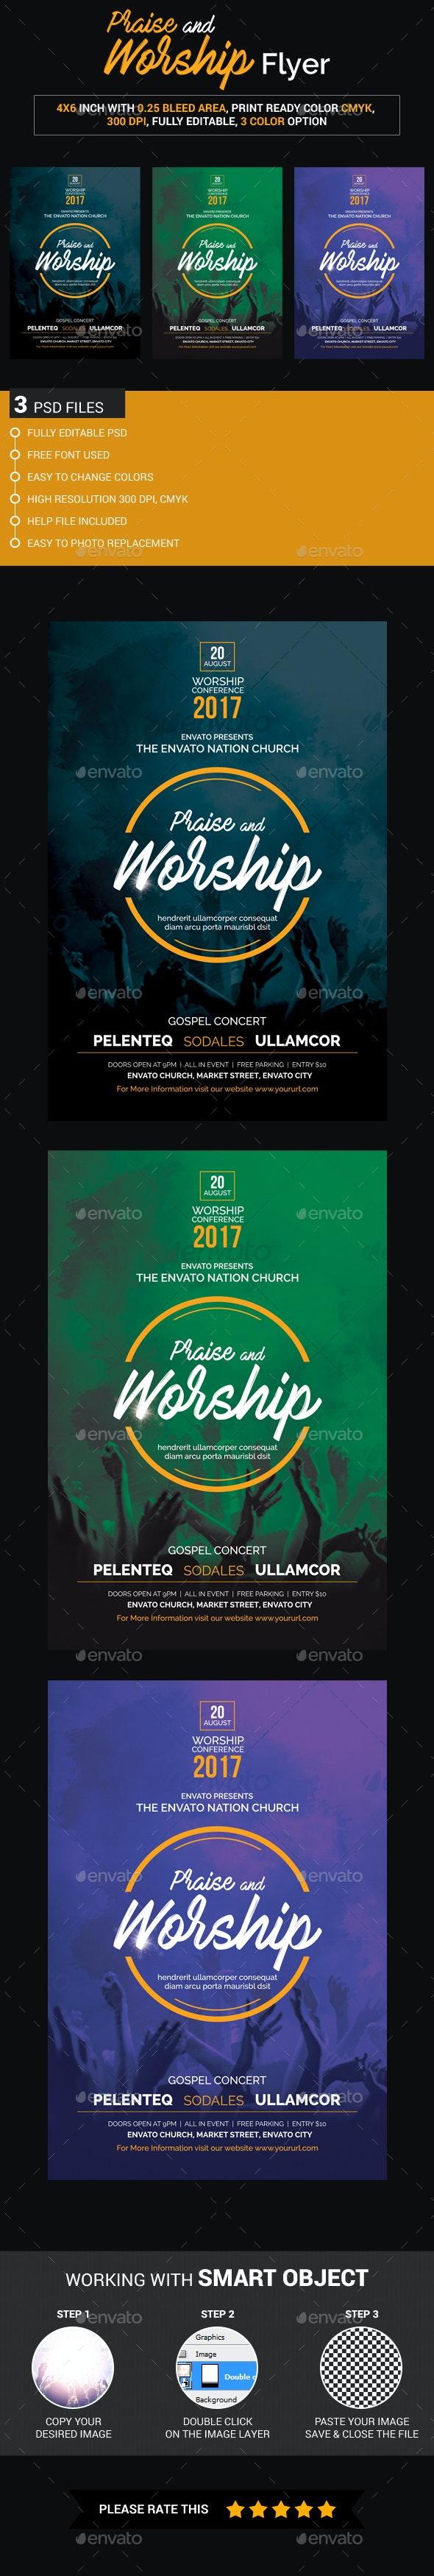 Praise and Worship Flyer - Church Flyers